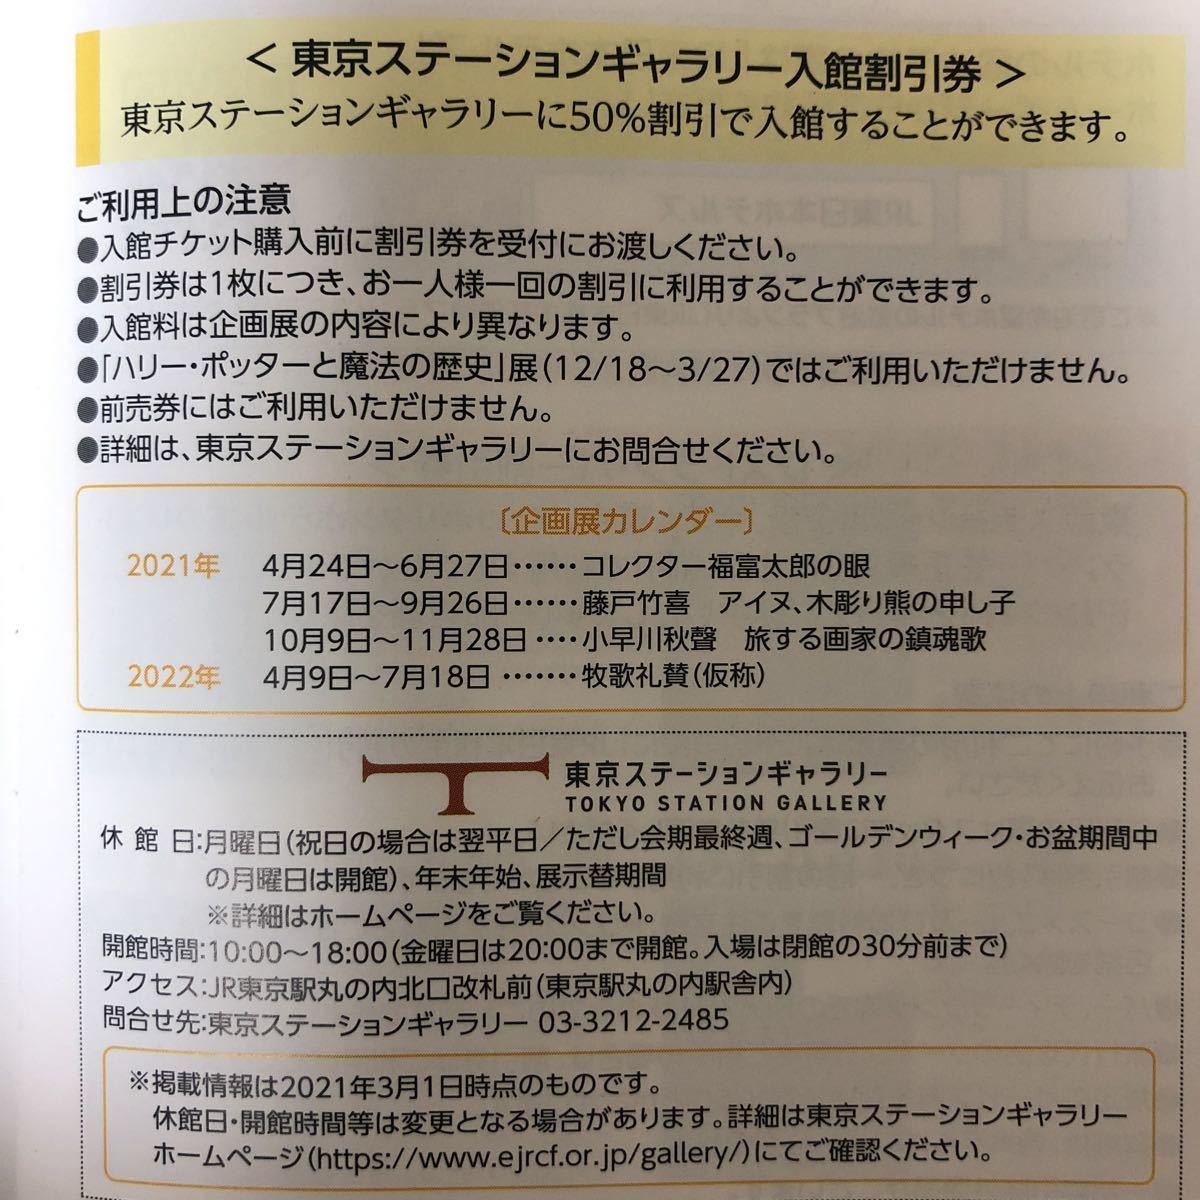 JR東日本 株主優待 宿泊券美術館ステーションギャラリー入館割引券ホテルメトロポリタンMETSメッツファミリーオフォルクローロ2枚ずつ_画像5